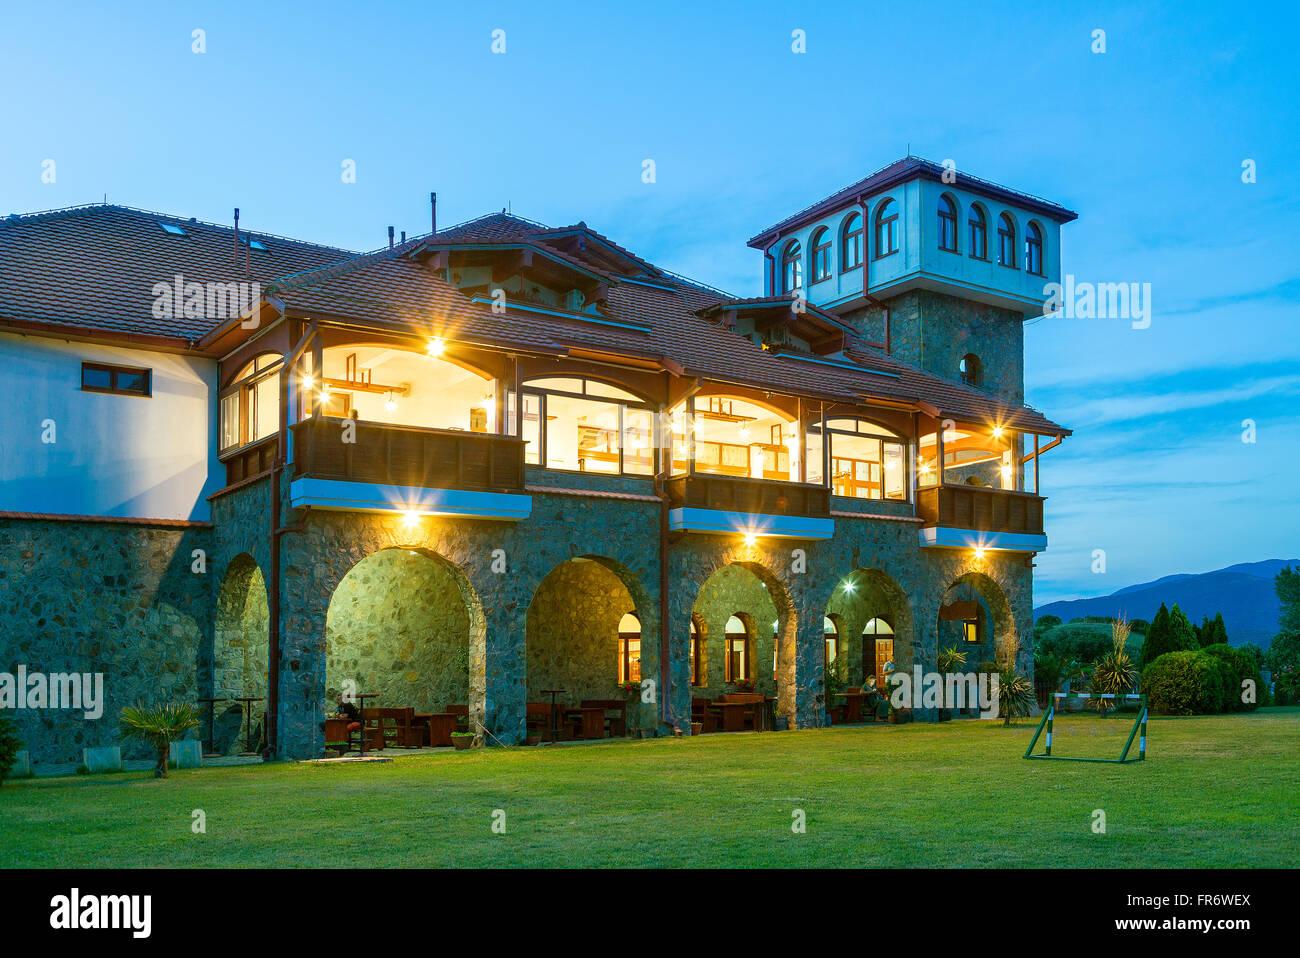 Republic of Macedonia, wine region Demir Kapija, Popova Kula winery - Stock Image